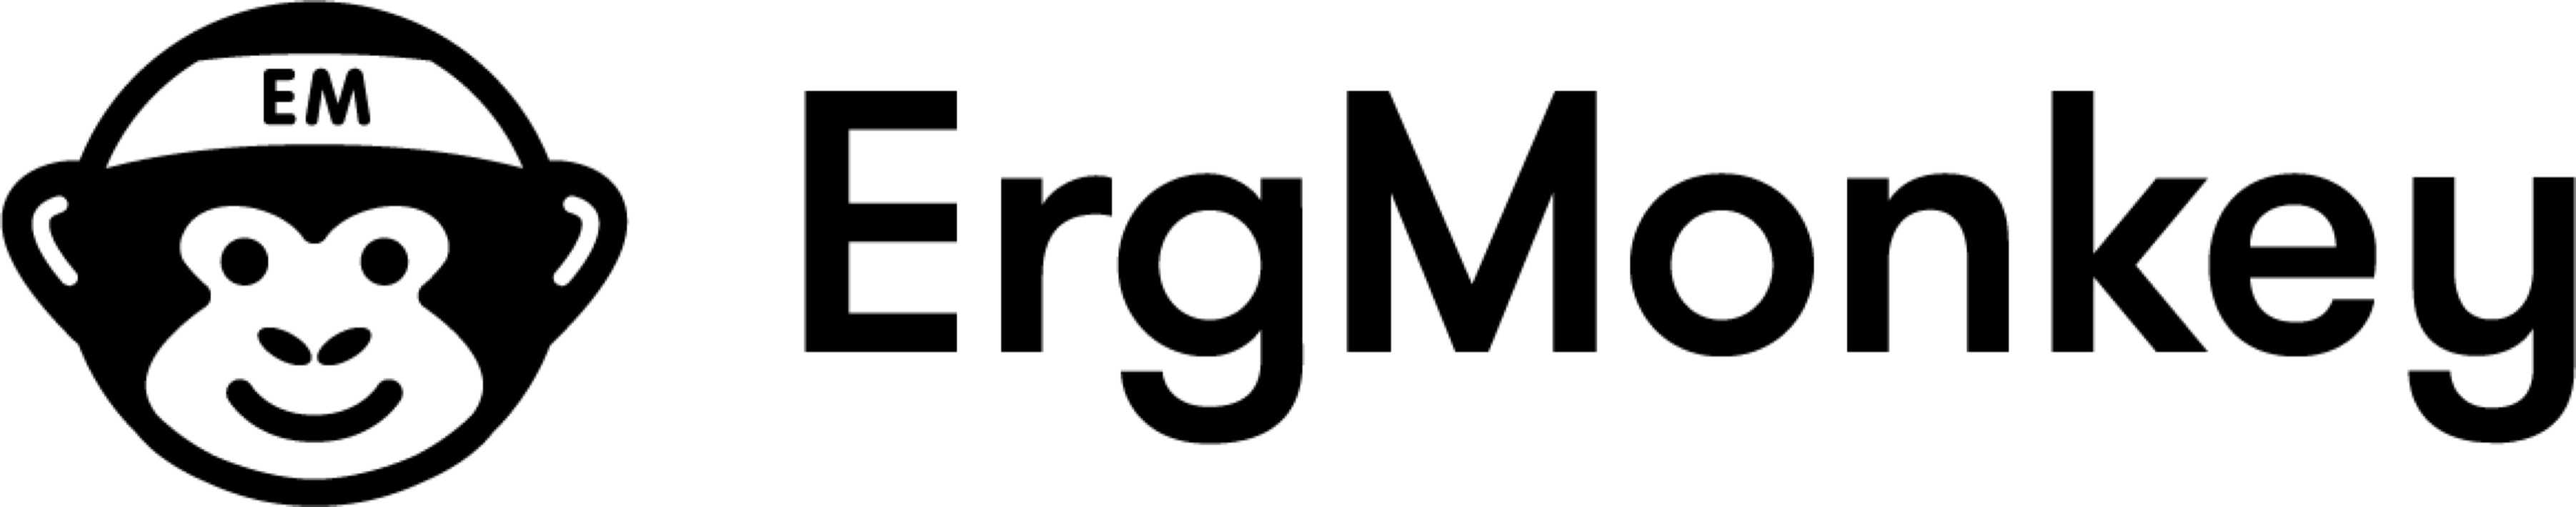 Ergmonkey full logo